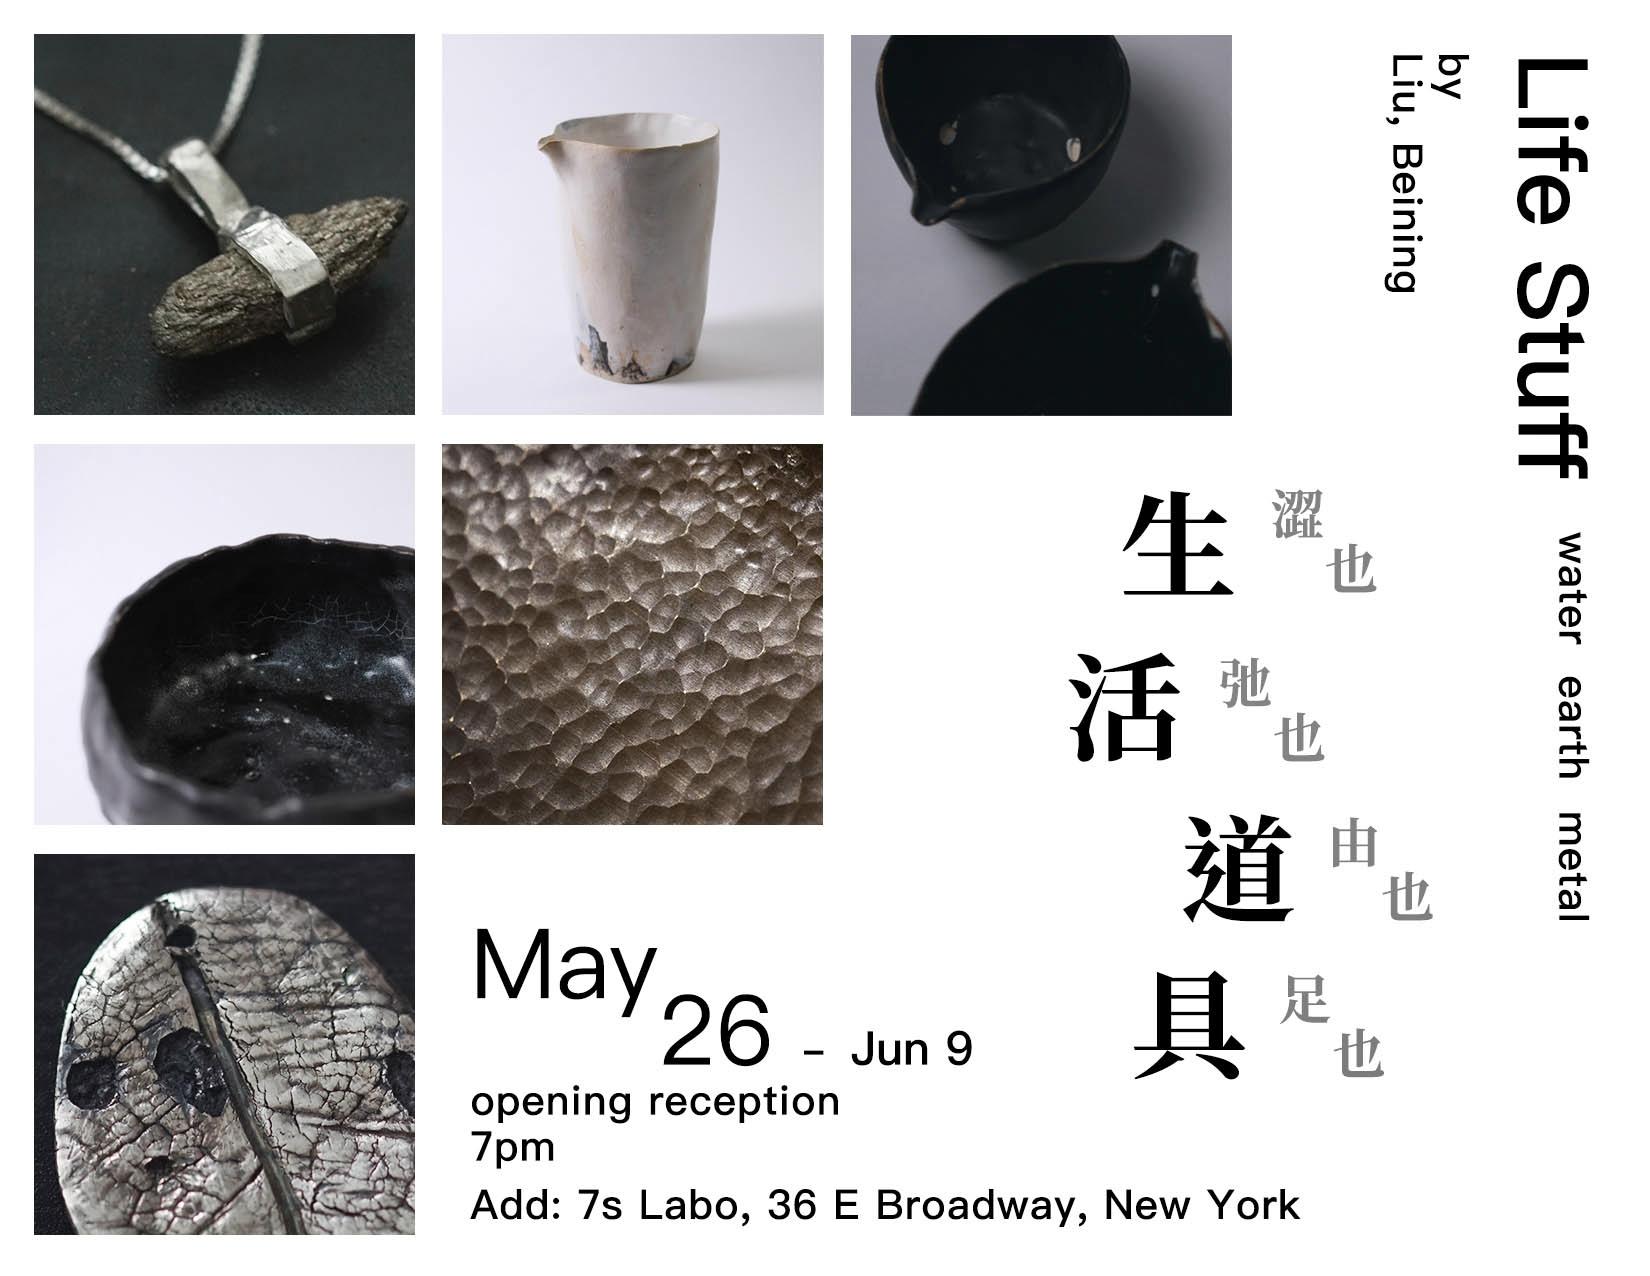 Life Stuff crafts by Liu, Beining      Opening:  2017-5-26, 19:00   Dates:  2017-5-26 to 2017-6-9   Location:  7s Labo, 36 E Broadway, NY 10002  点击查看 中文完整新闻稿